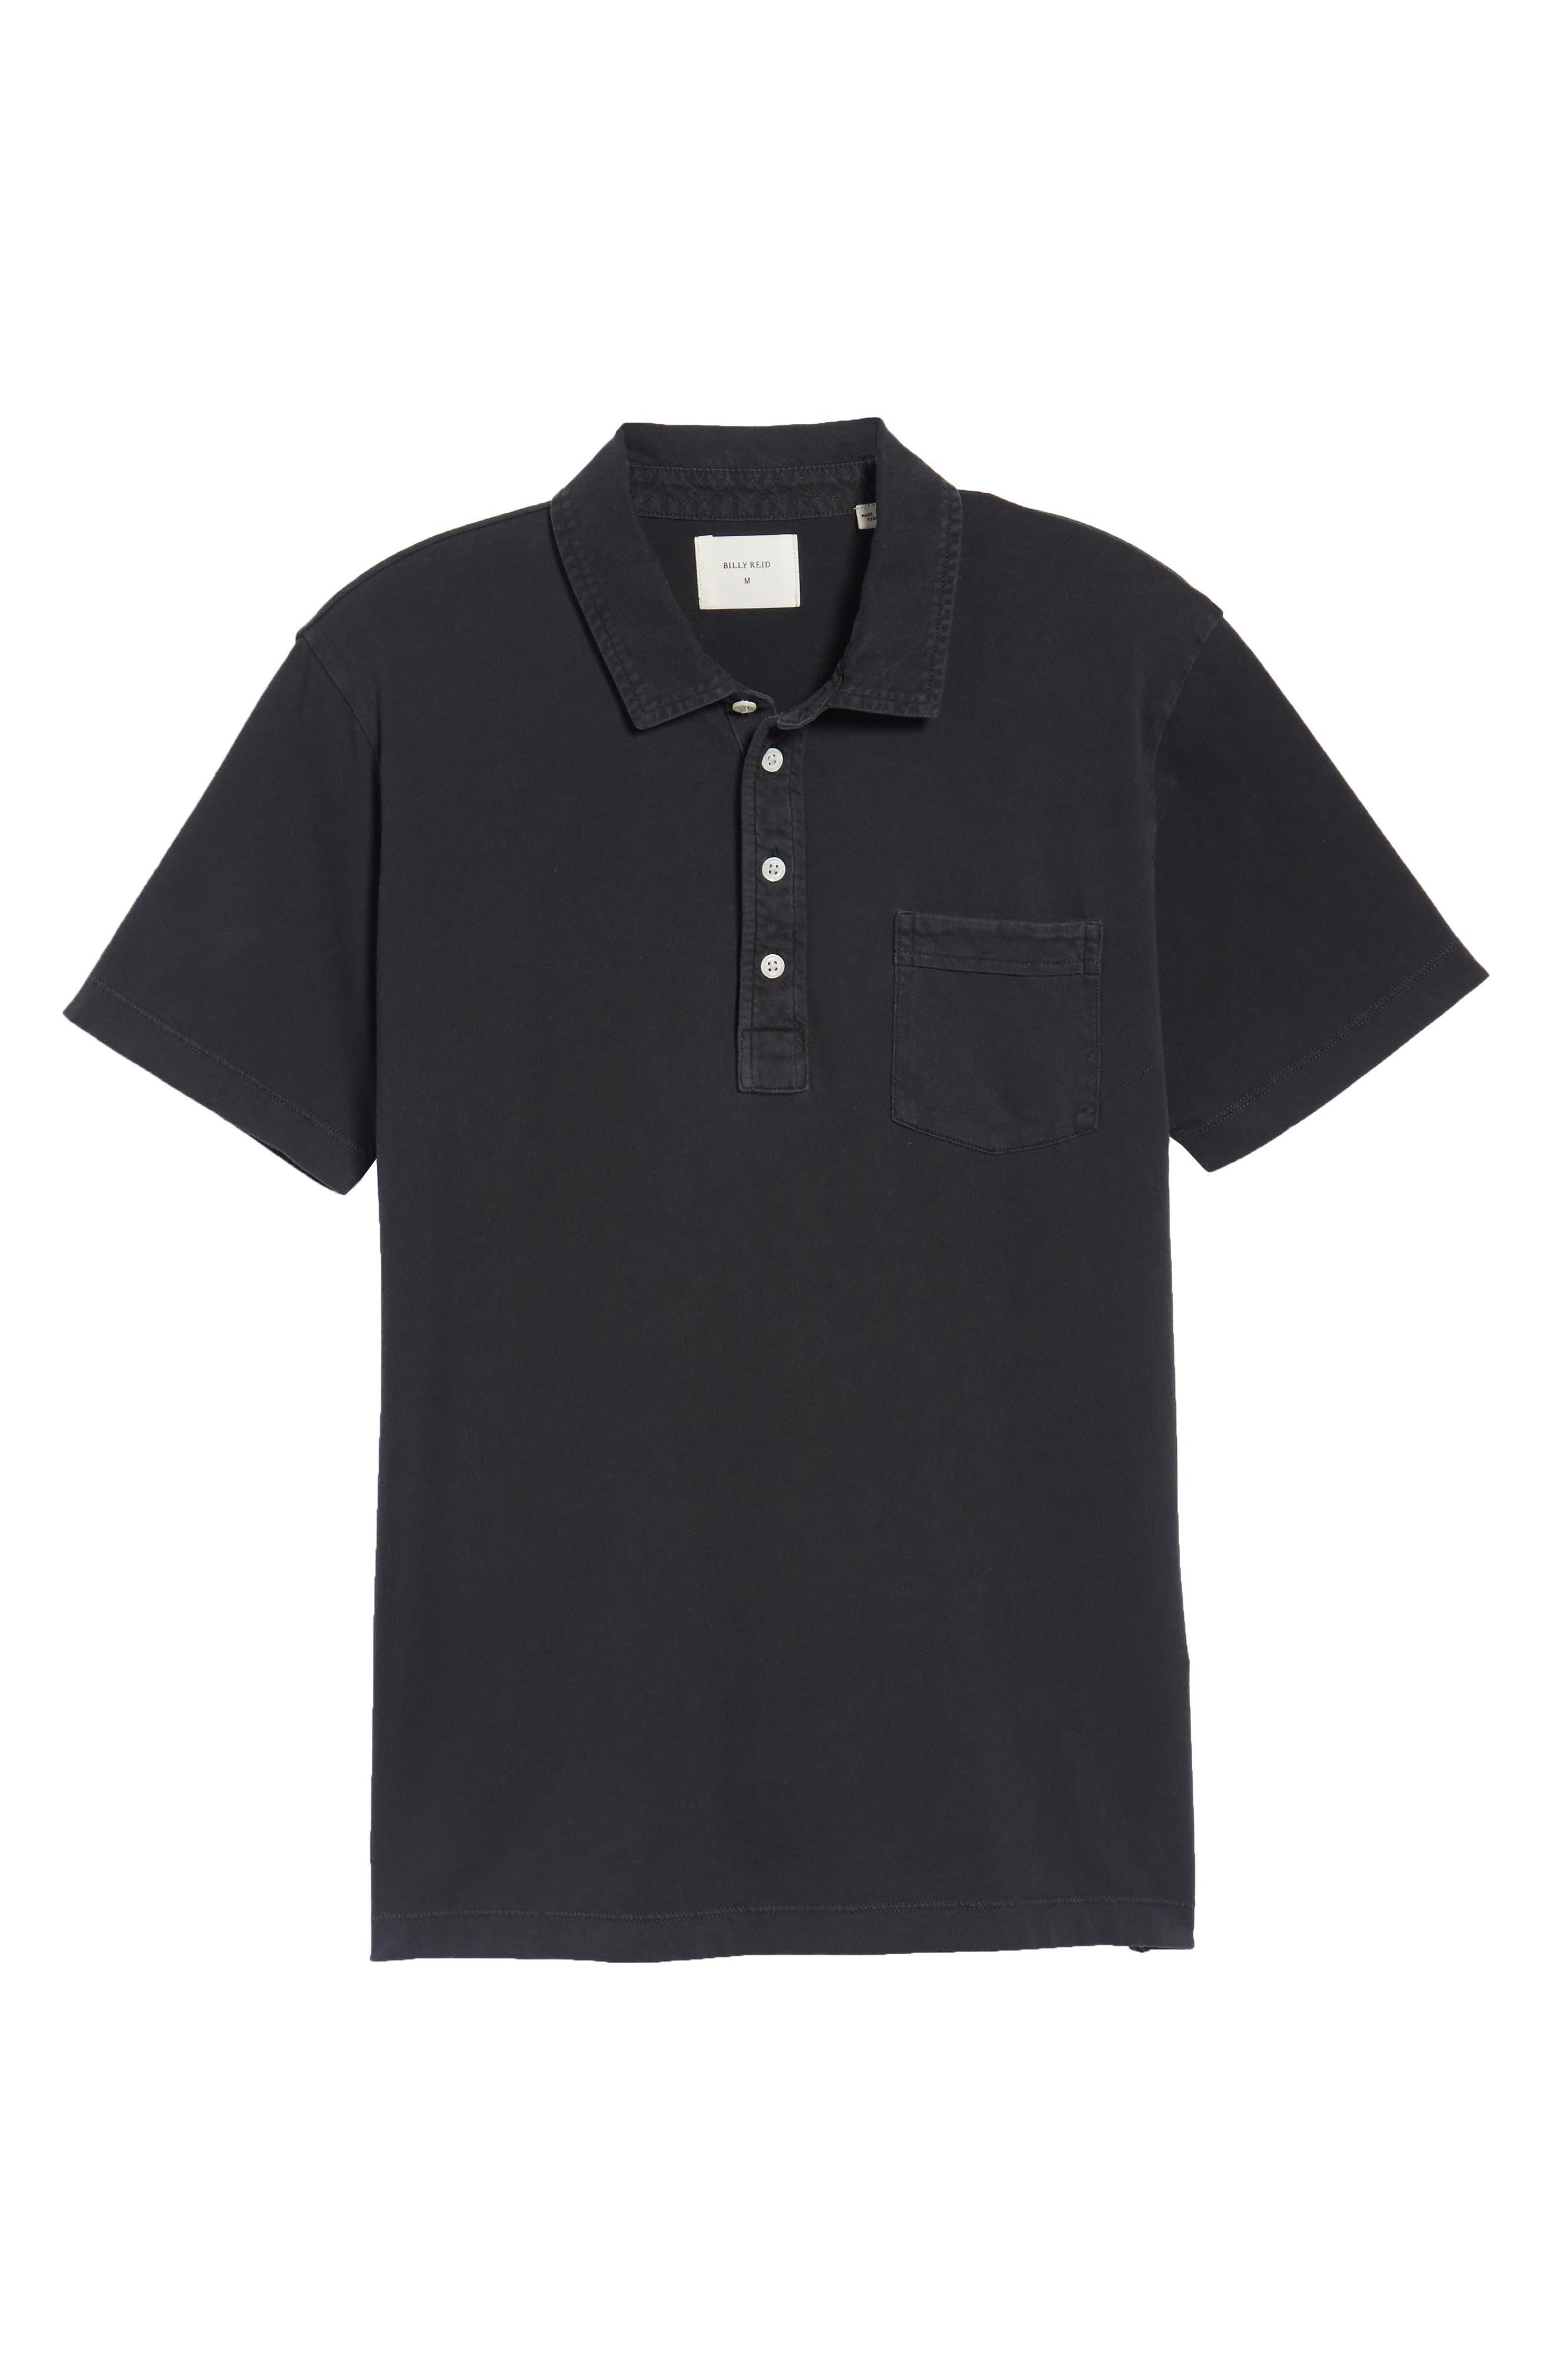 Pensacola GD Slim Fit Polo,                             Alternate thumbnail 6, color,                             Black